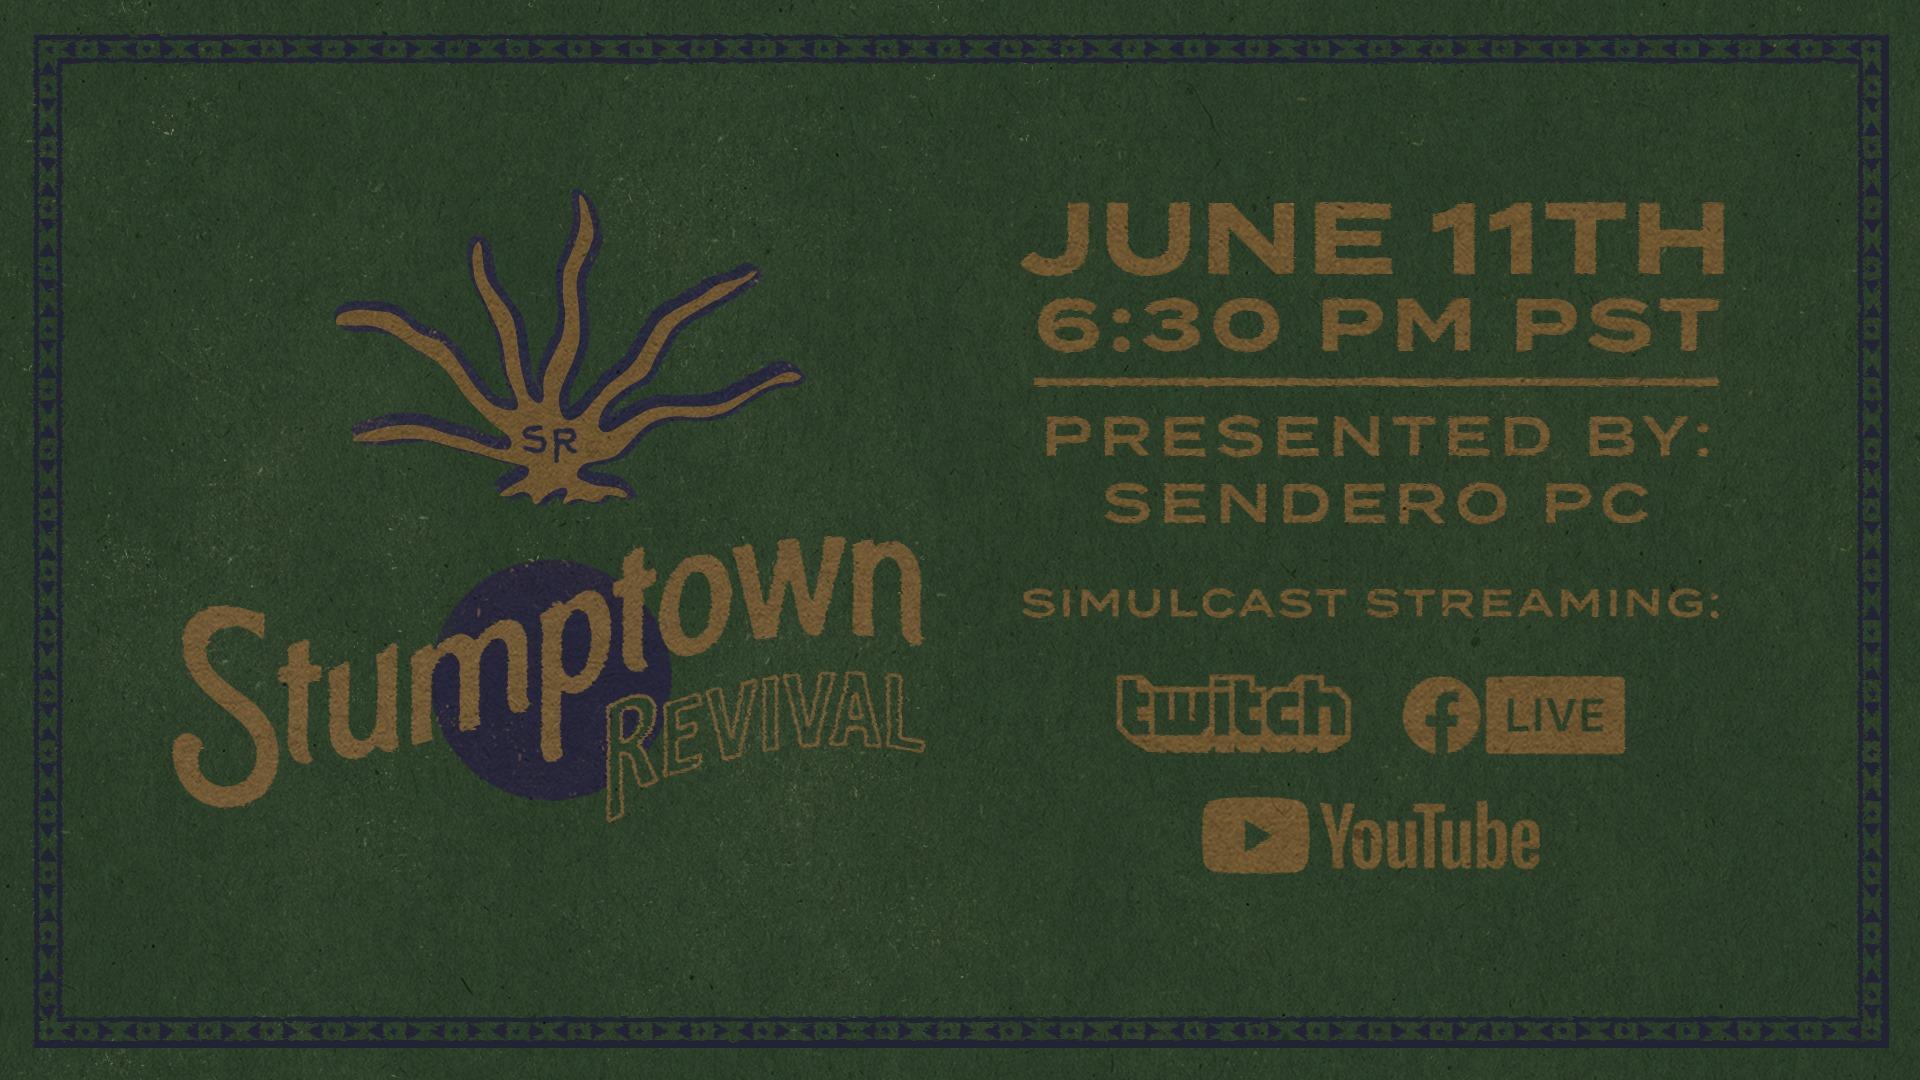 Stumptown Revival: A Live Stream Benefit Concert - June 11, 2020